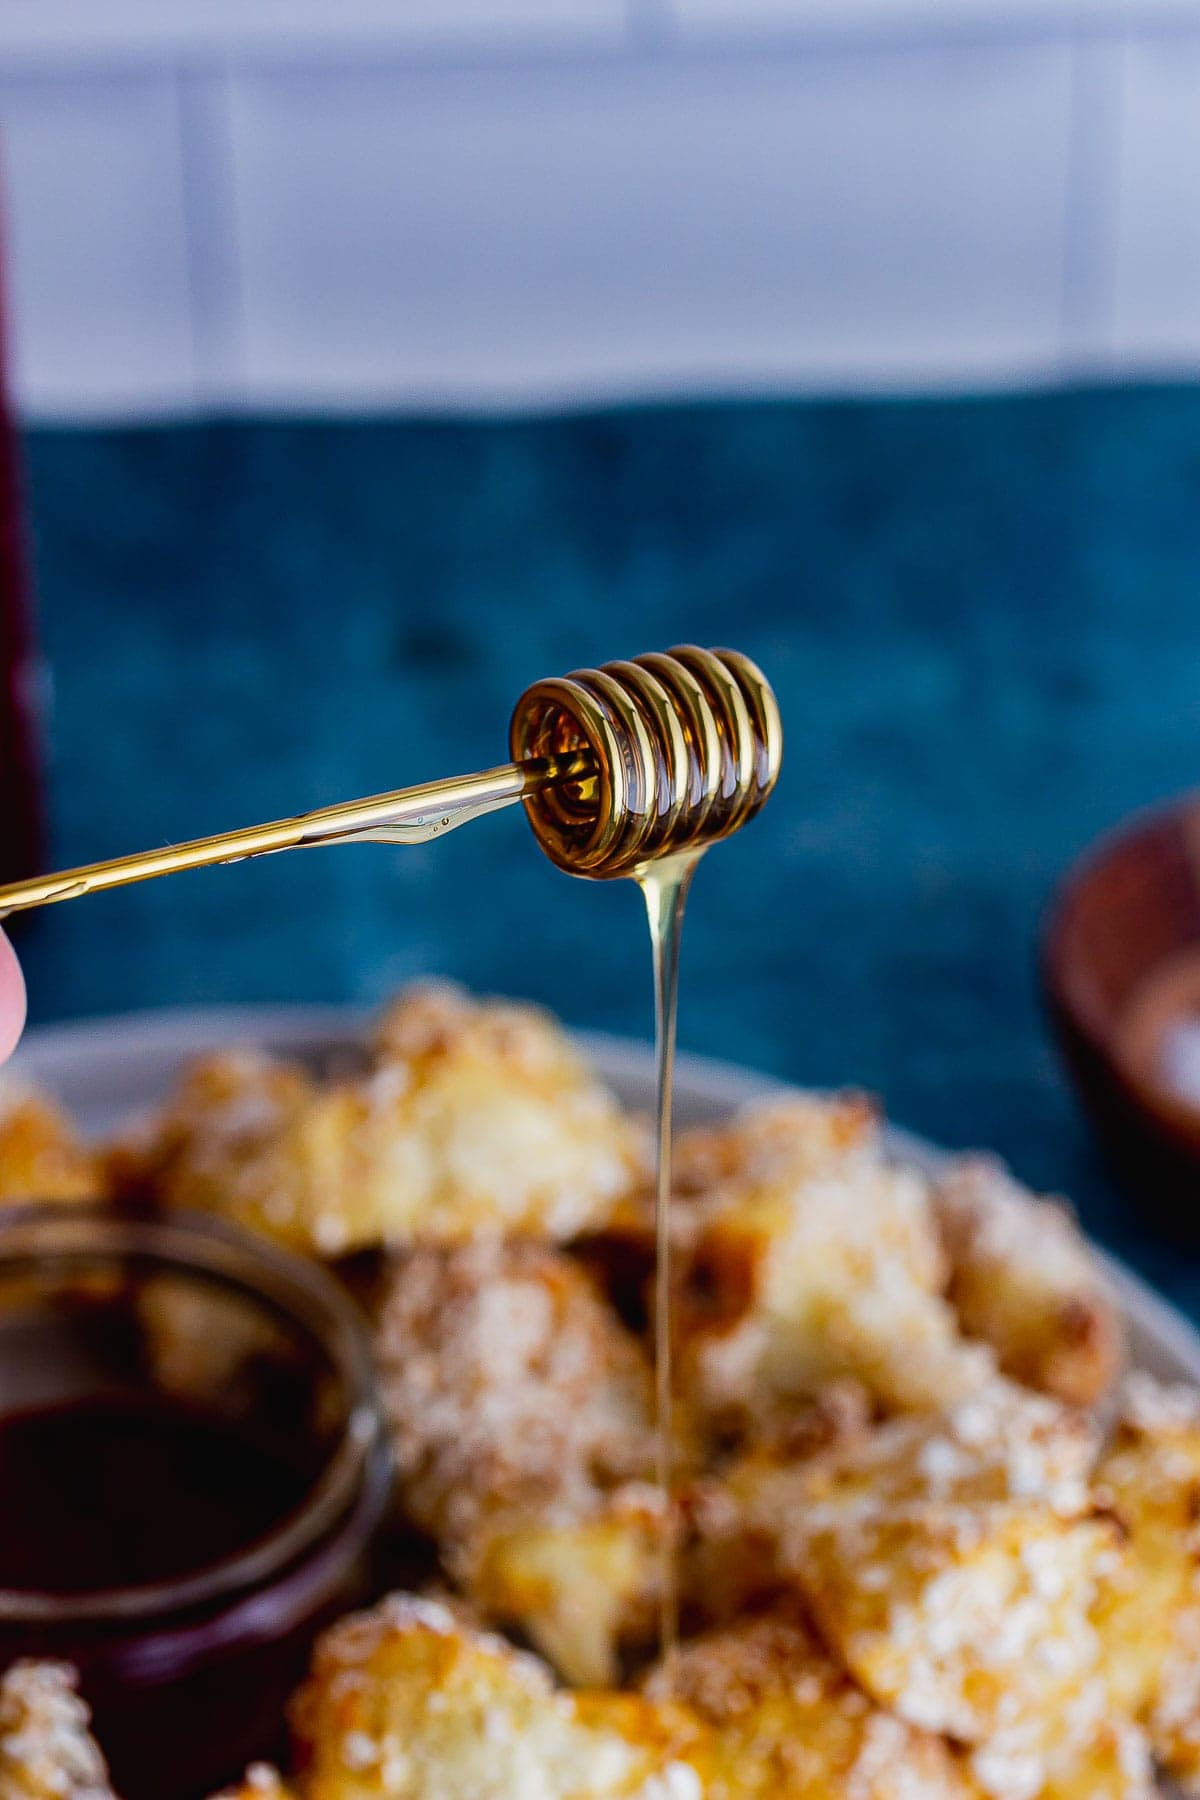 Honey on a honey drizzler